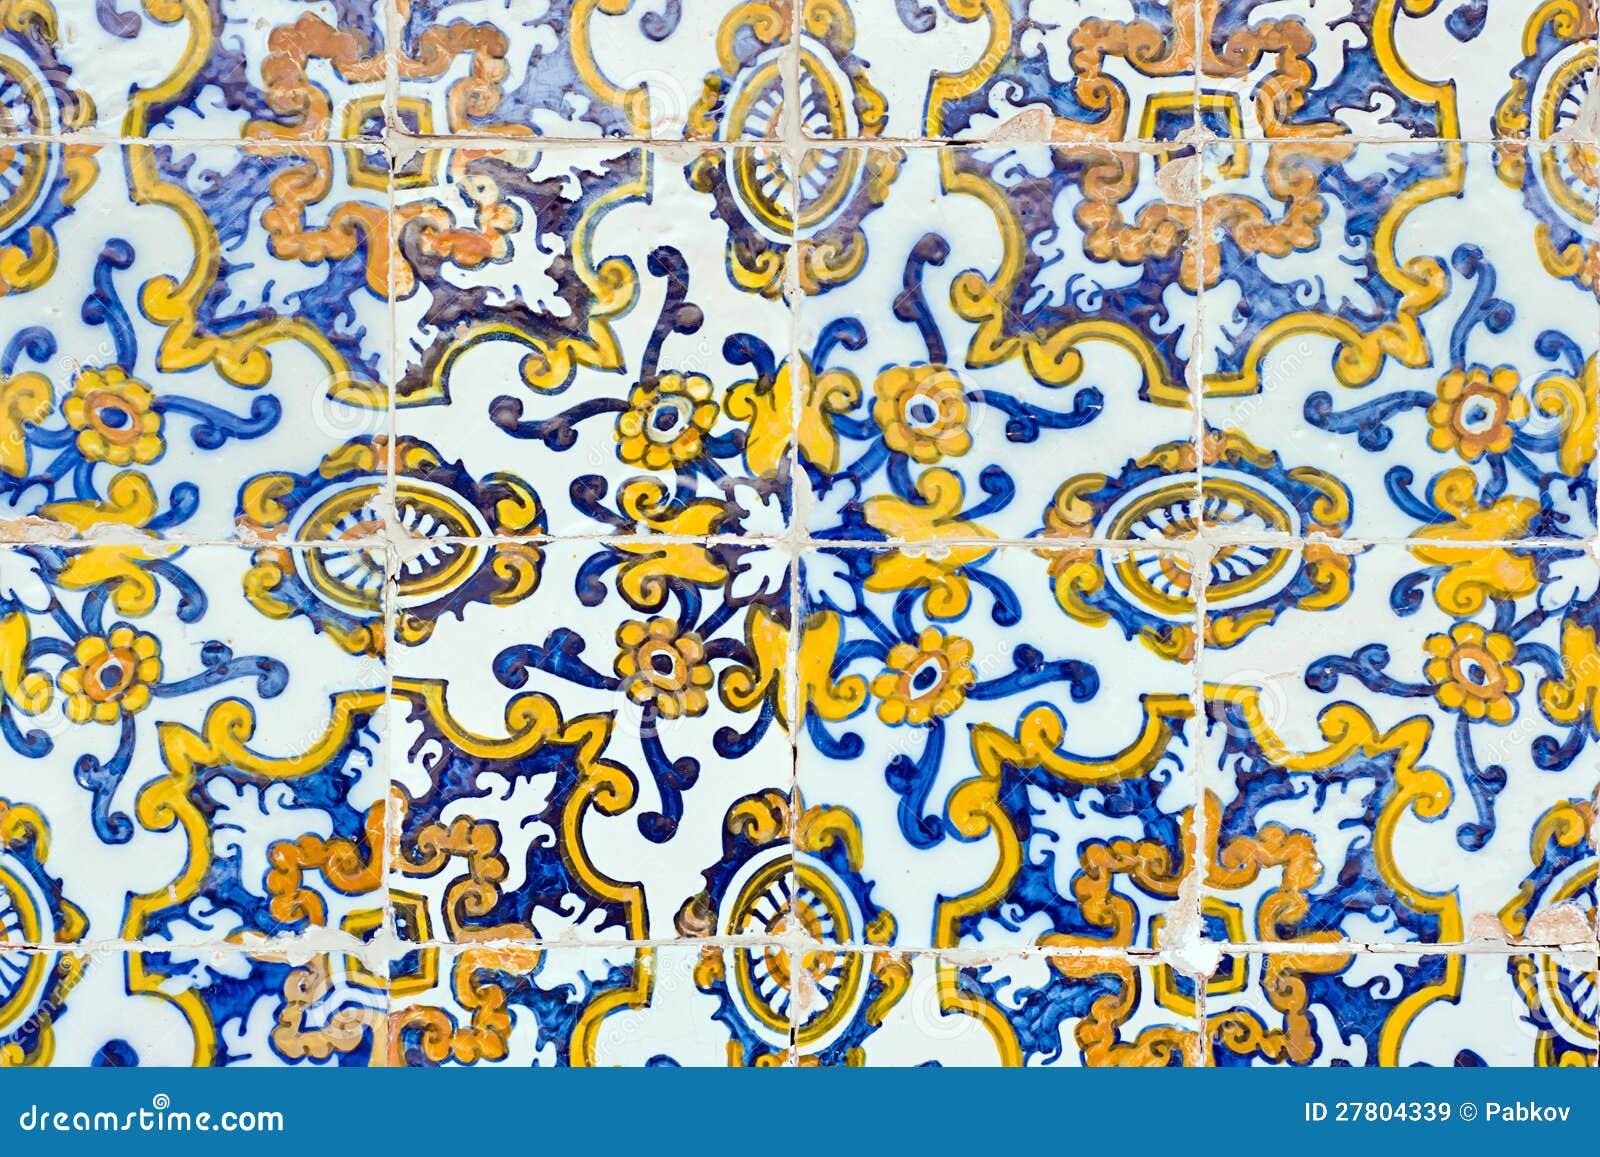 Vintage Spanish Style Ceramic Tiles Stock Image Image